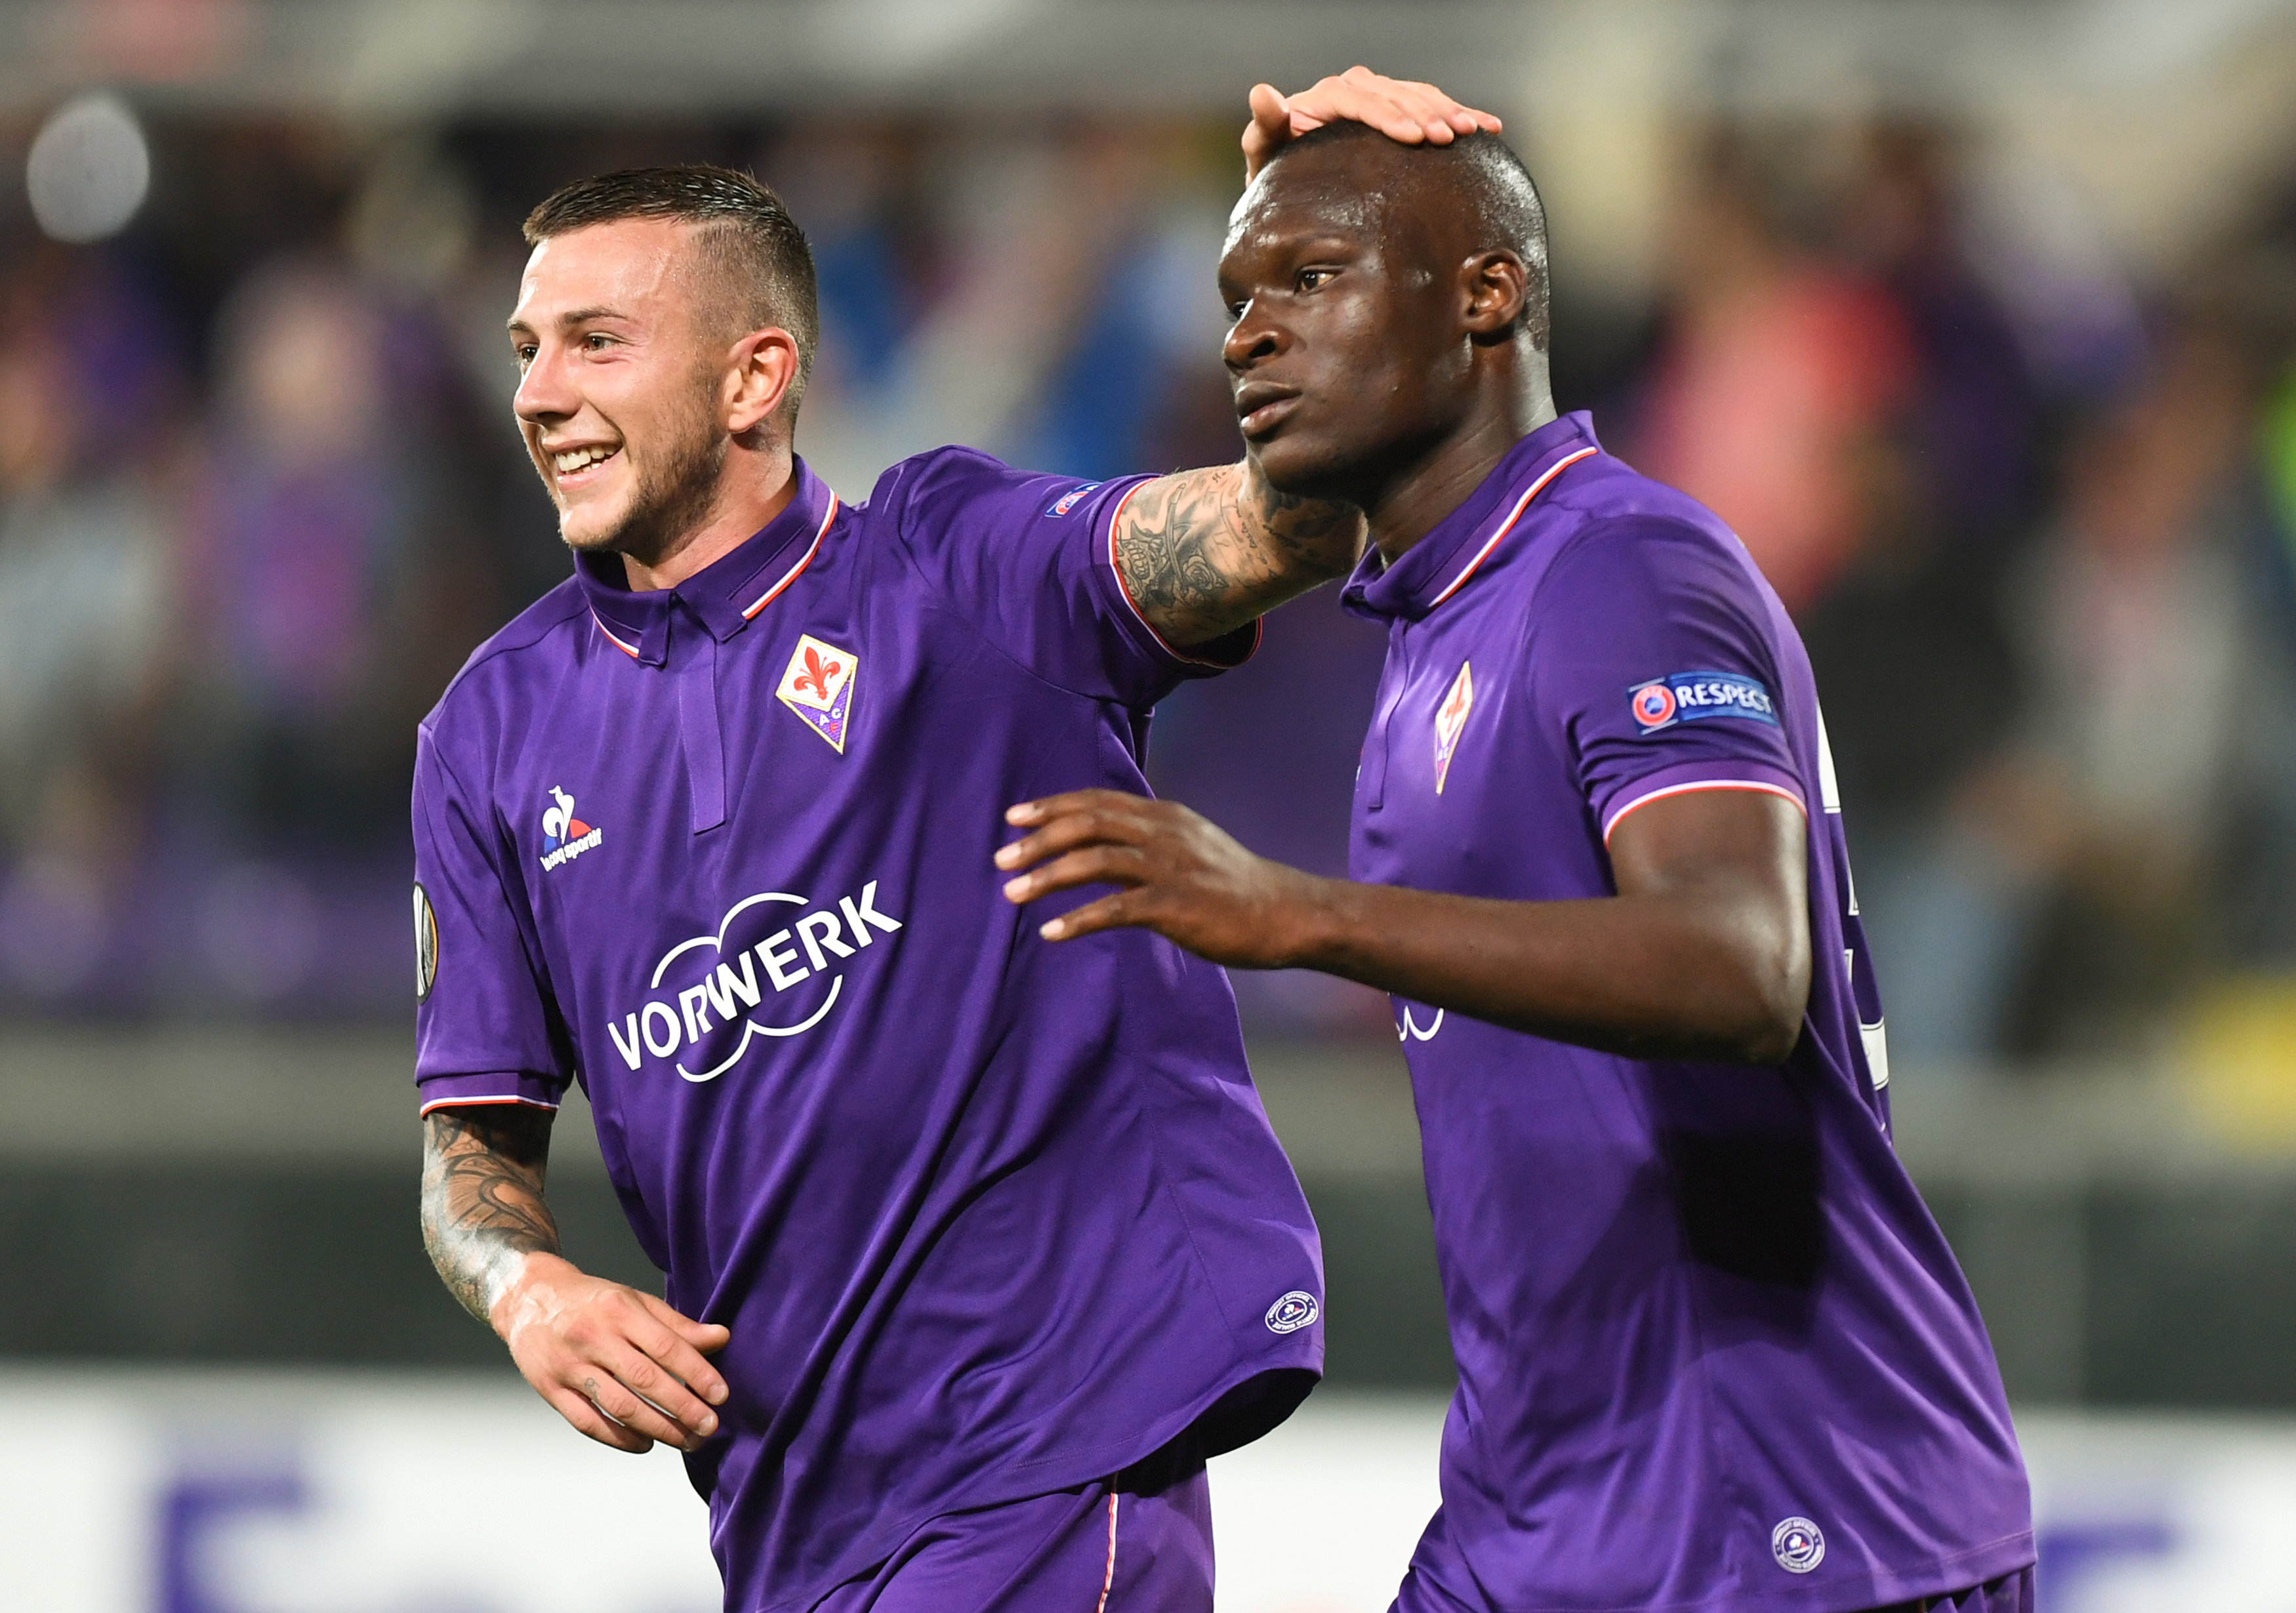 Football Soccer - Fiorentina v Qarabag - UEFA Europa League Group Stage - Group J